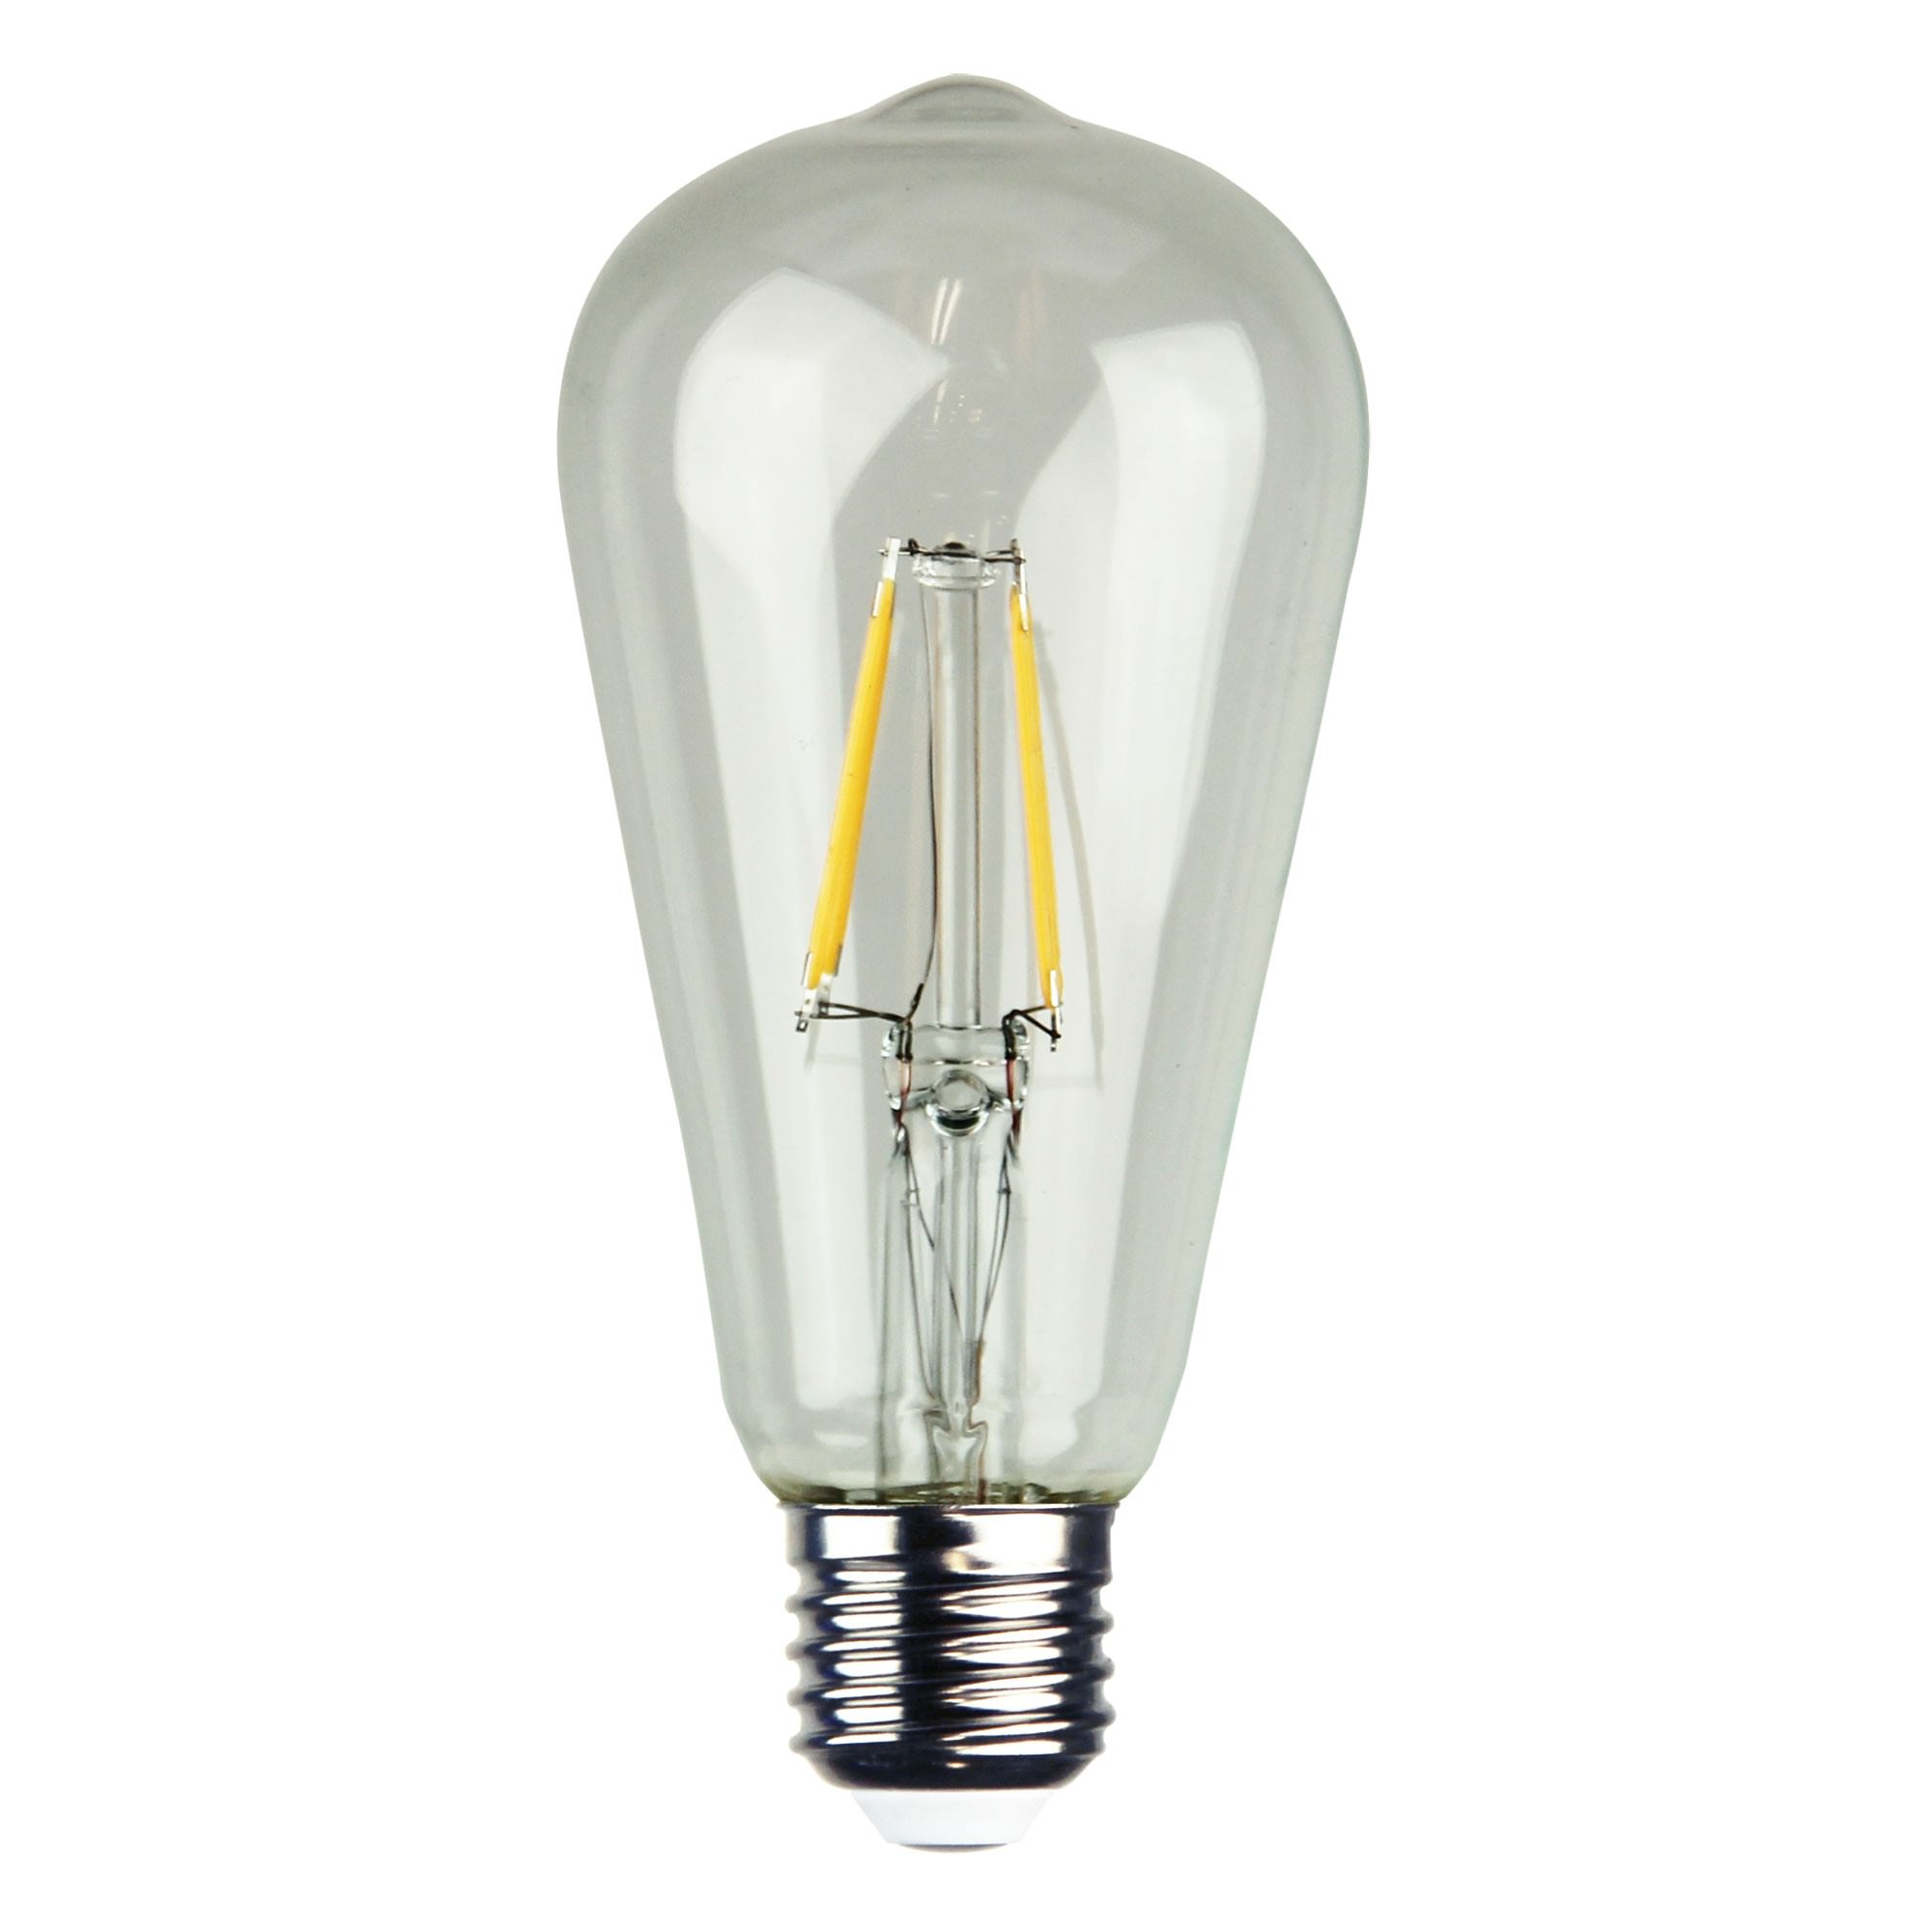 Allume ST64 Dimmable LED Filament Globe, E27, 2700K, Clear